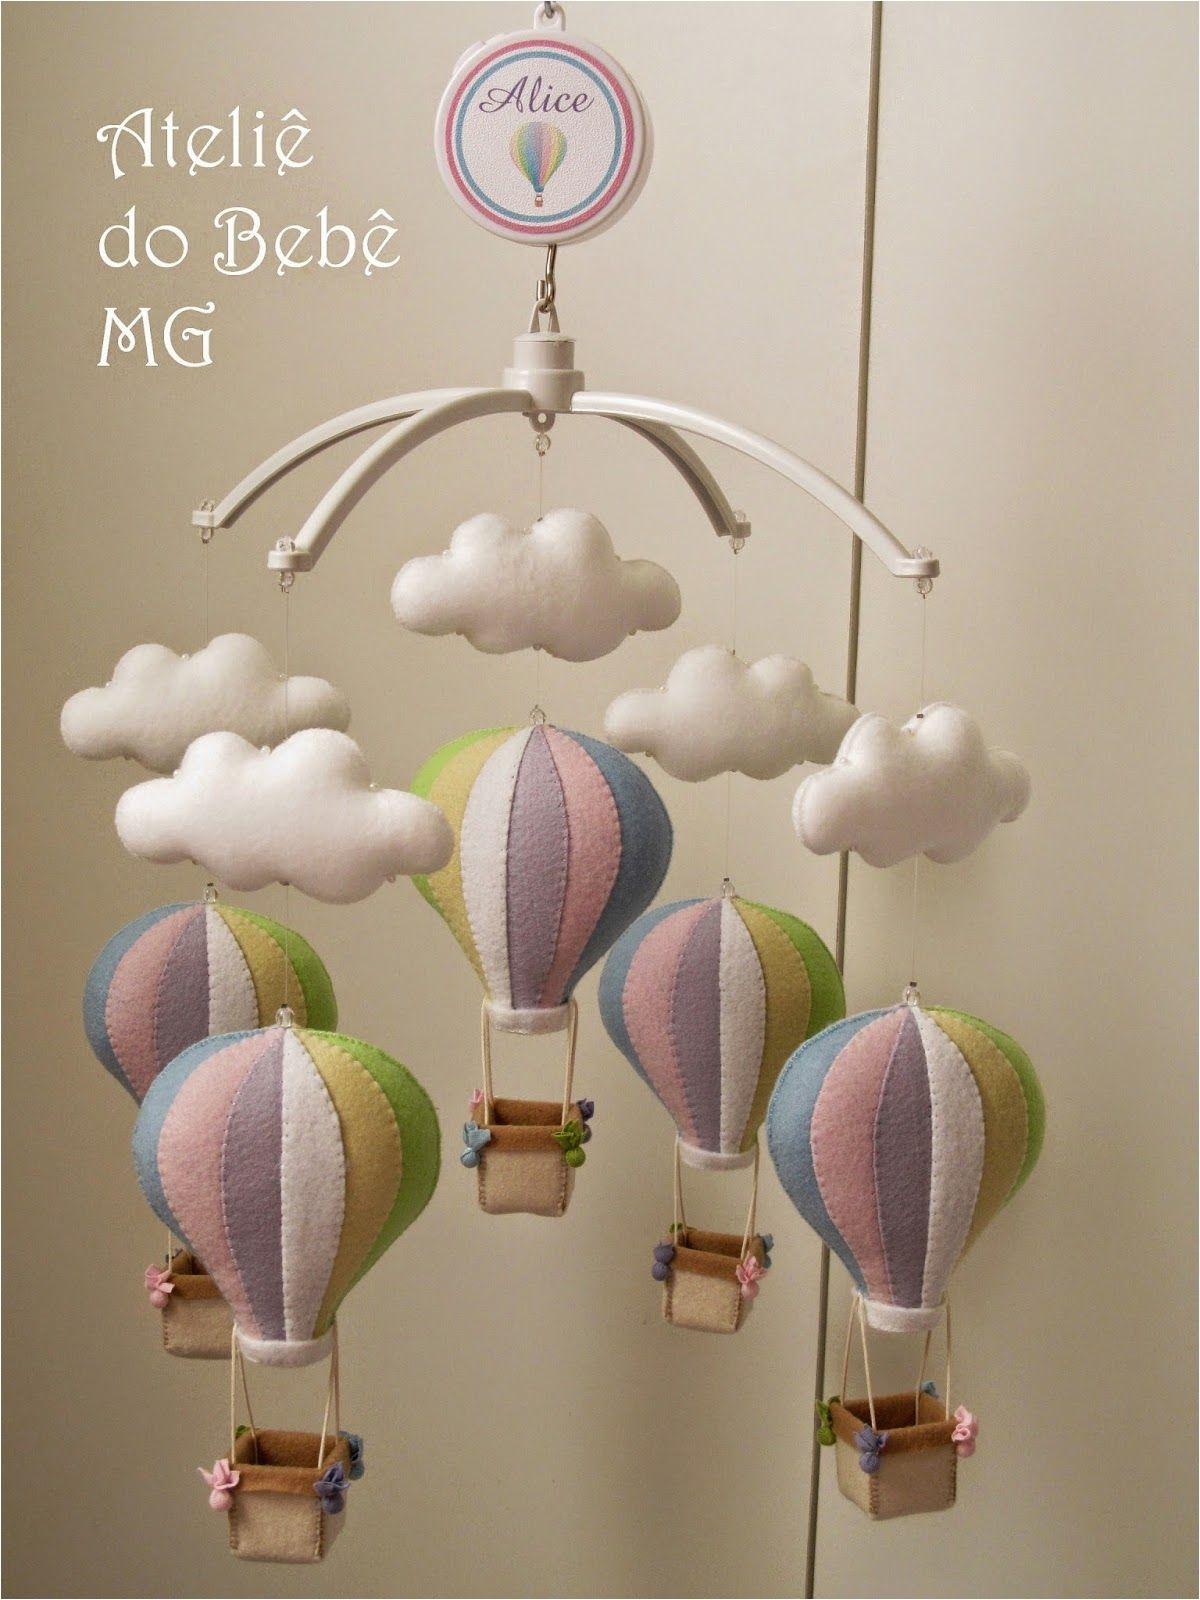 Crib Mobile with Lights ateliaa Do Bebaa Mg Ma³bile Musical Baloaµes E Nuvens Alice